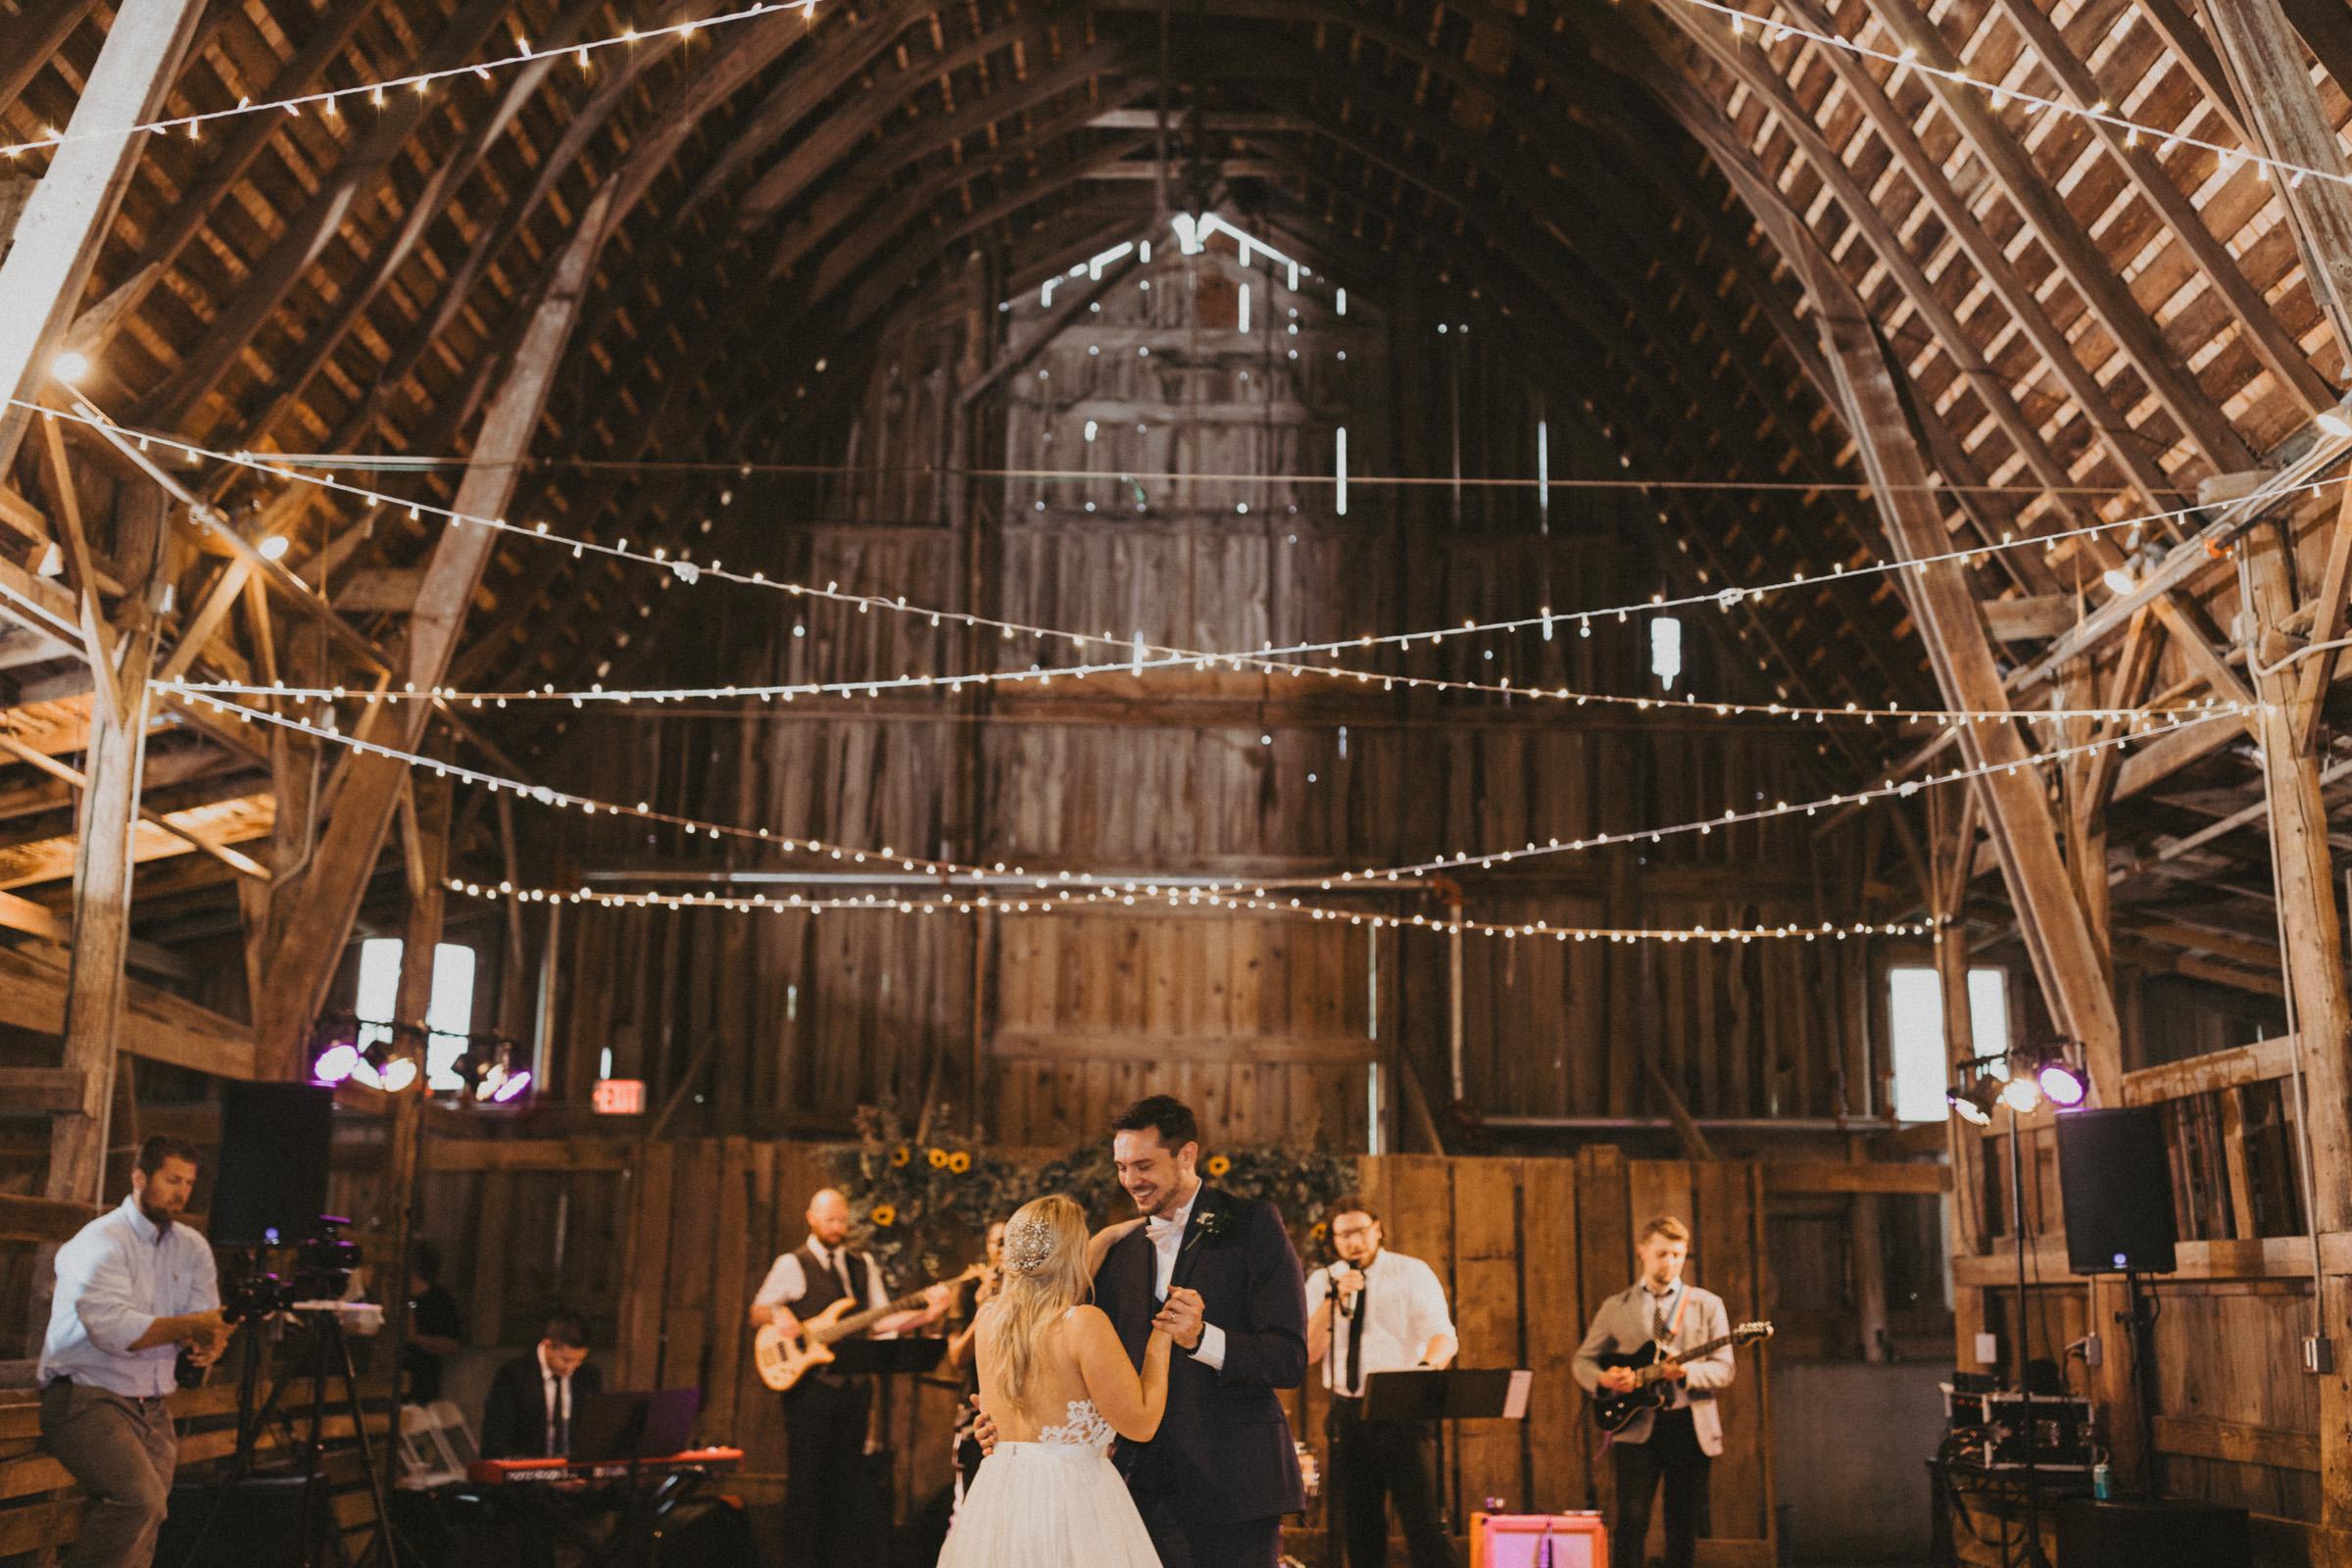 alyssa barletter photography nelson wedding nebraska city lied lodge morton barn spring wedding photographer-57.jpg